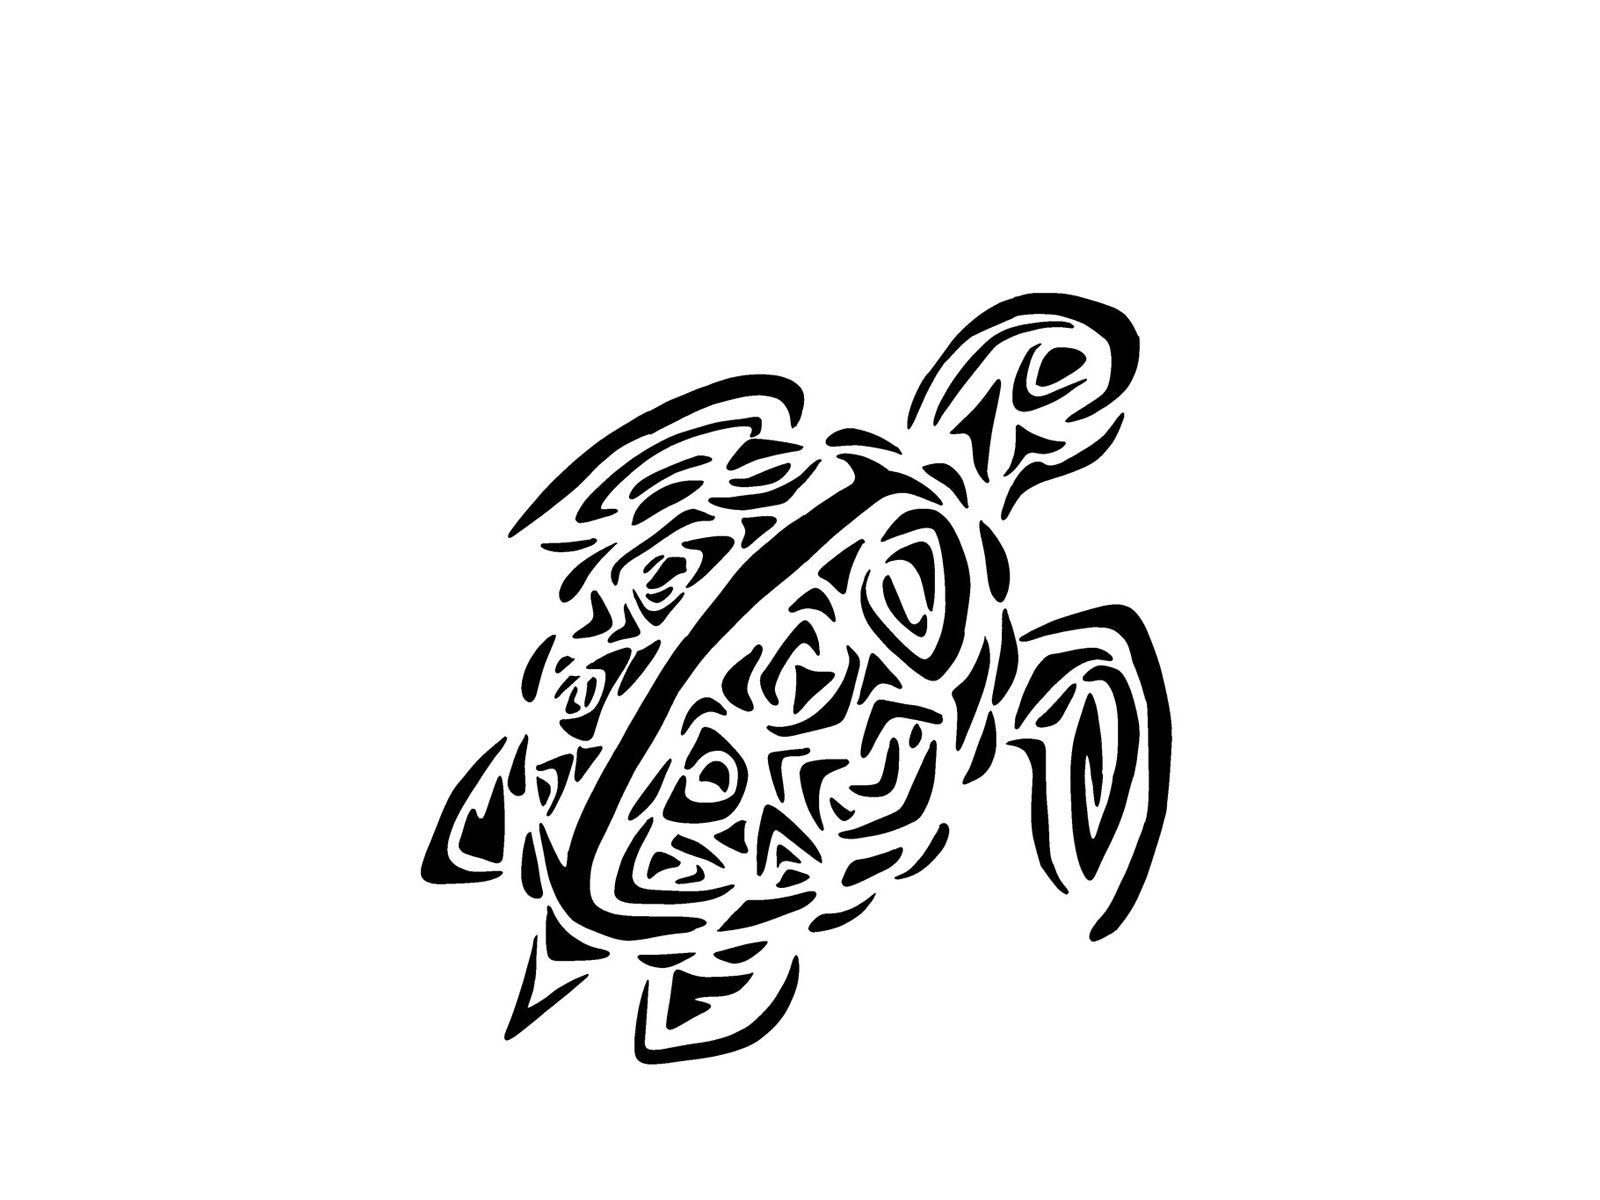 Turtle Line Drawing Tattoo : Sea turtle tribal little tattoo design good